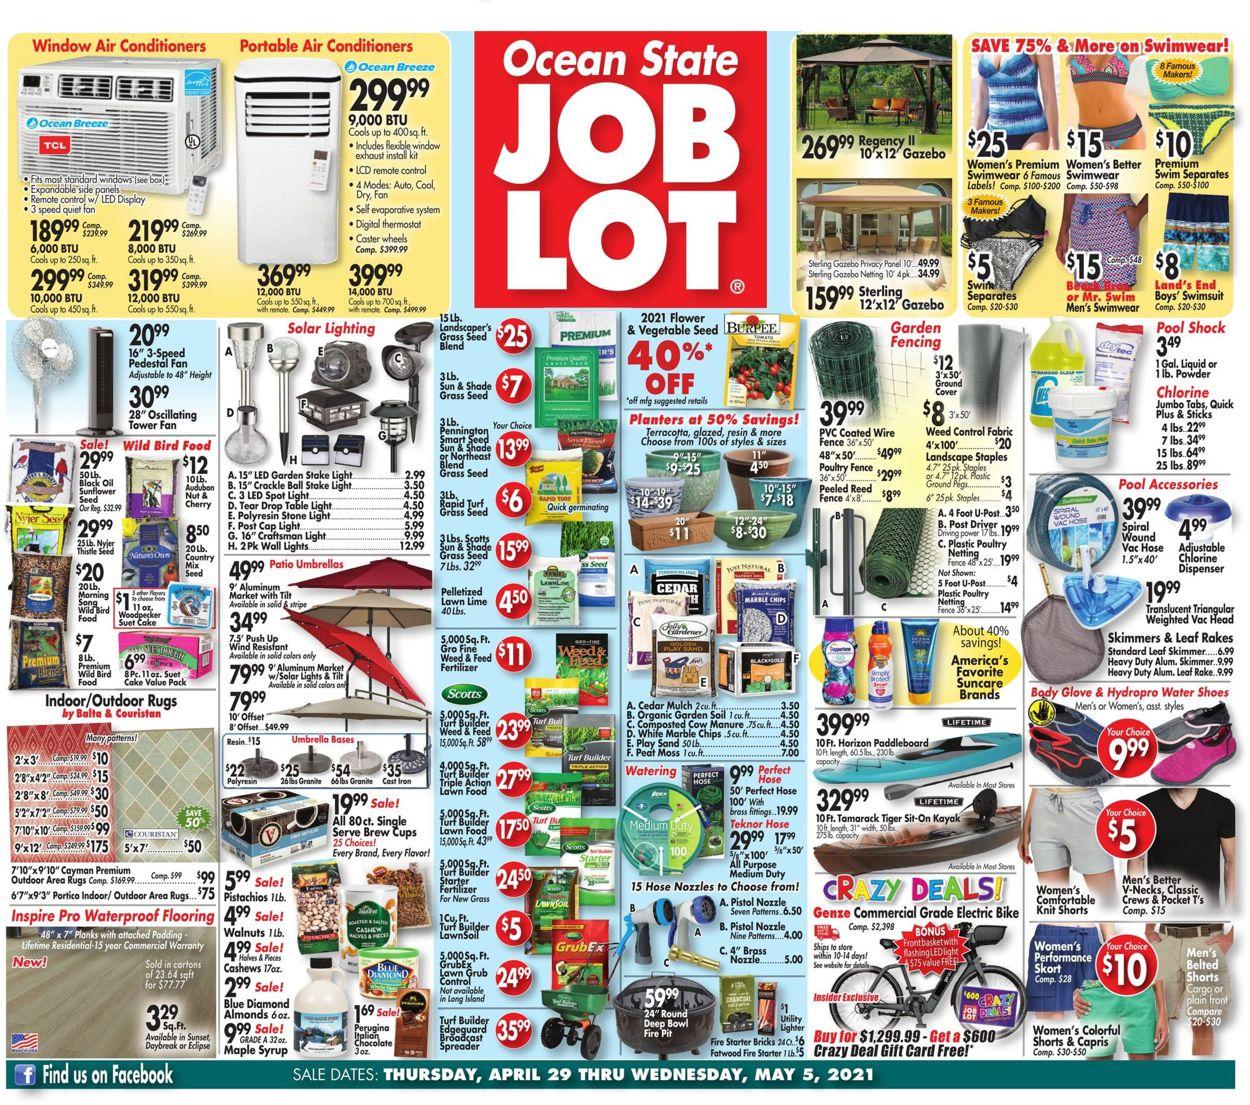 Ocean State Job Lot Weekly Ad Circular - valid 04/29-05/05/2021